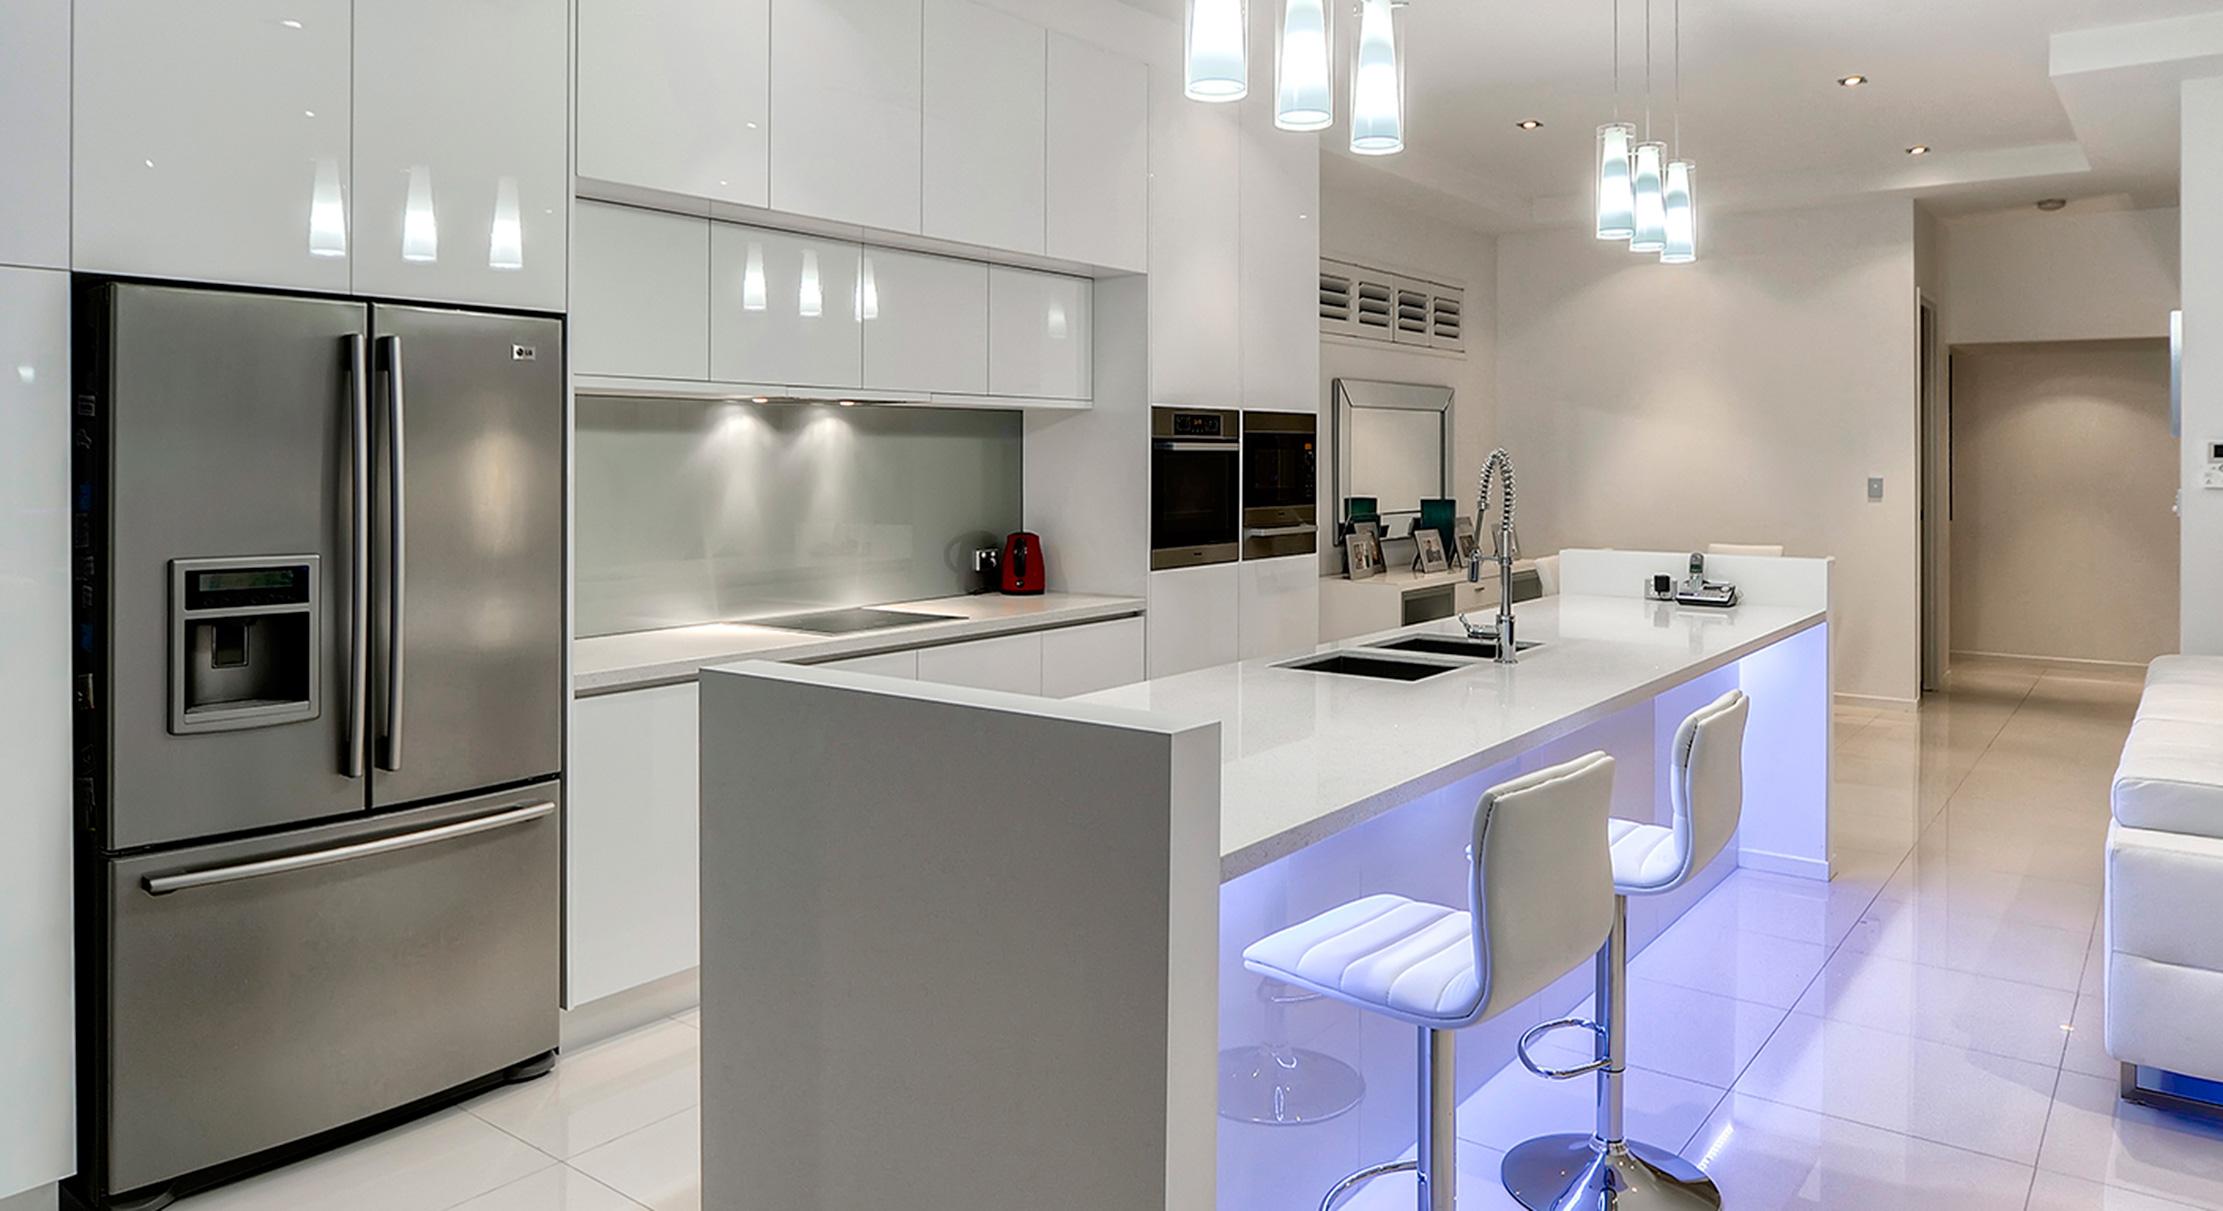 portfolio-1-slider-image-2-kitchen-hamilton-gary-cramb-constructions-brisbane